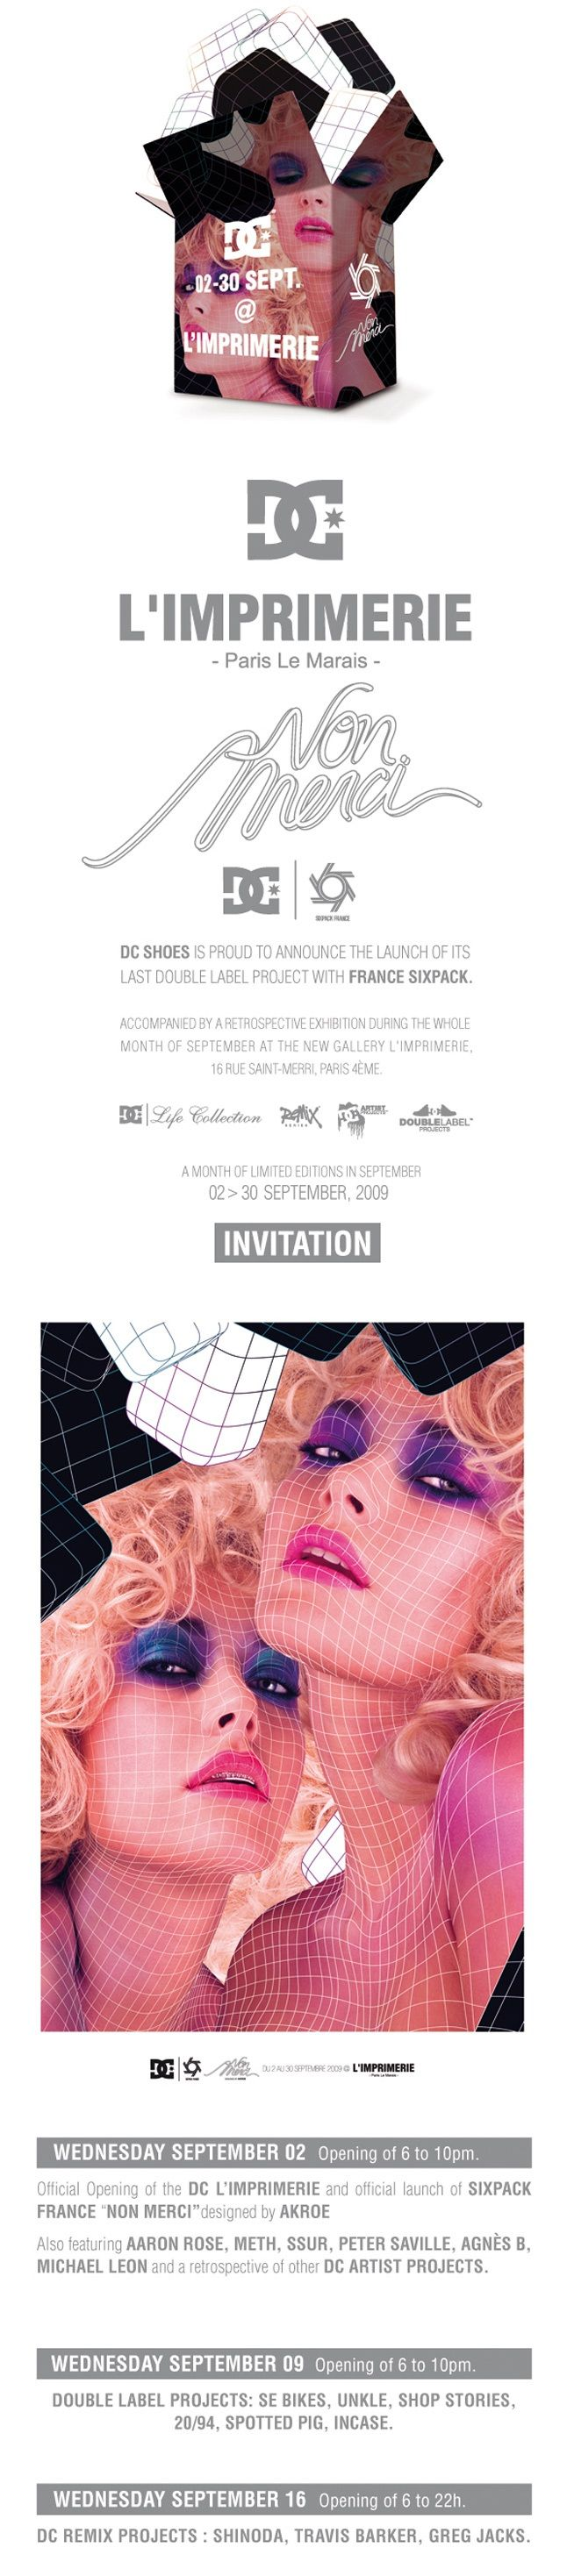 Invitation 646 1